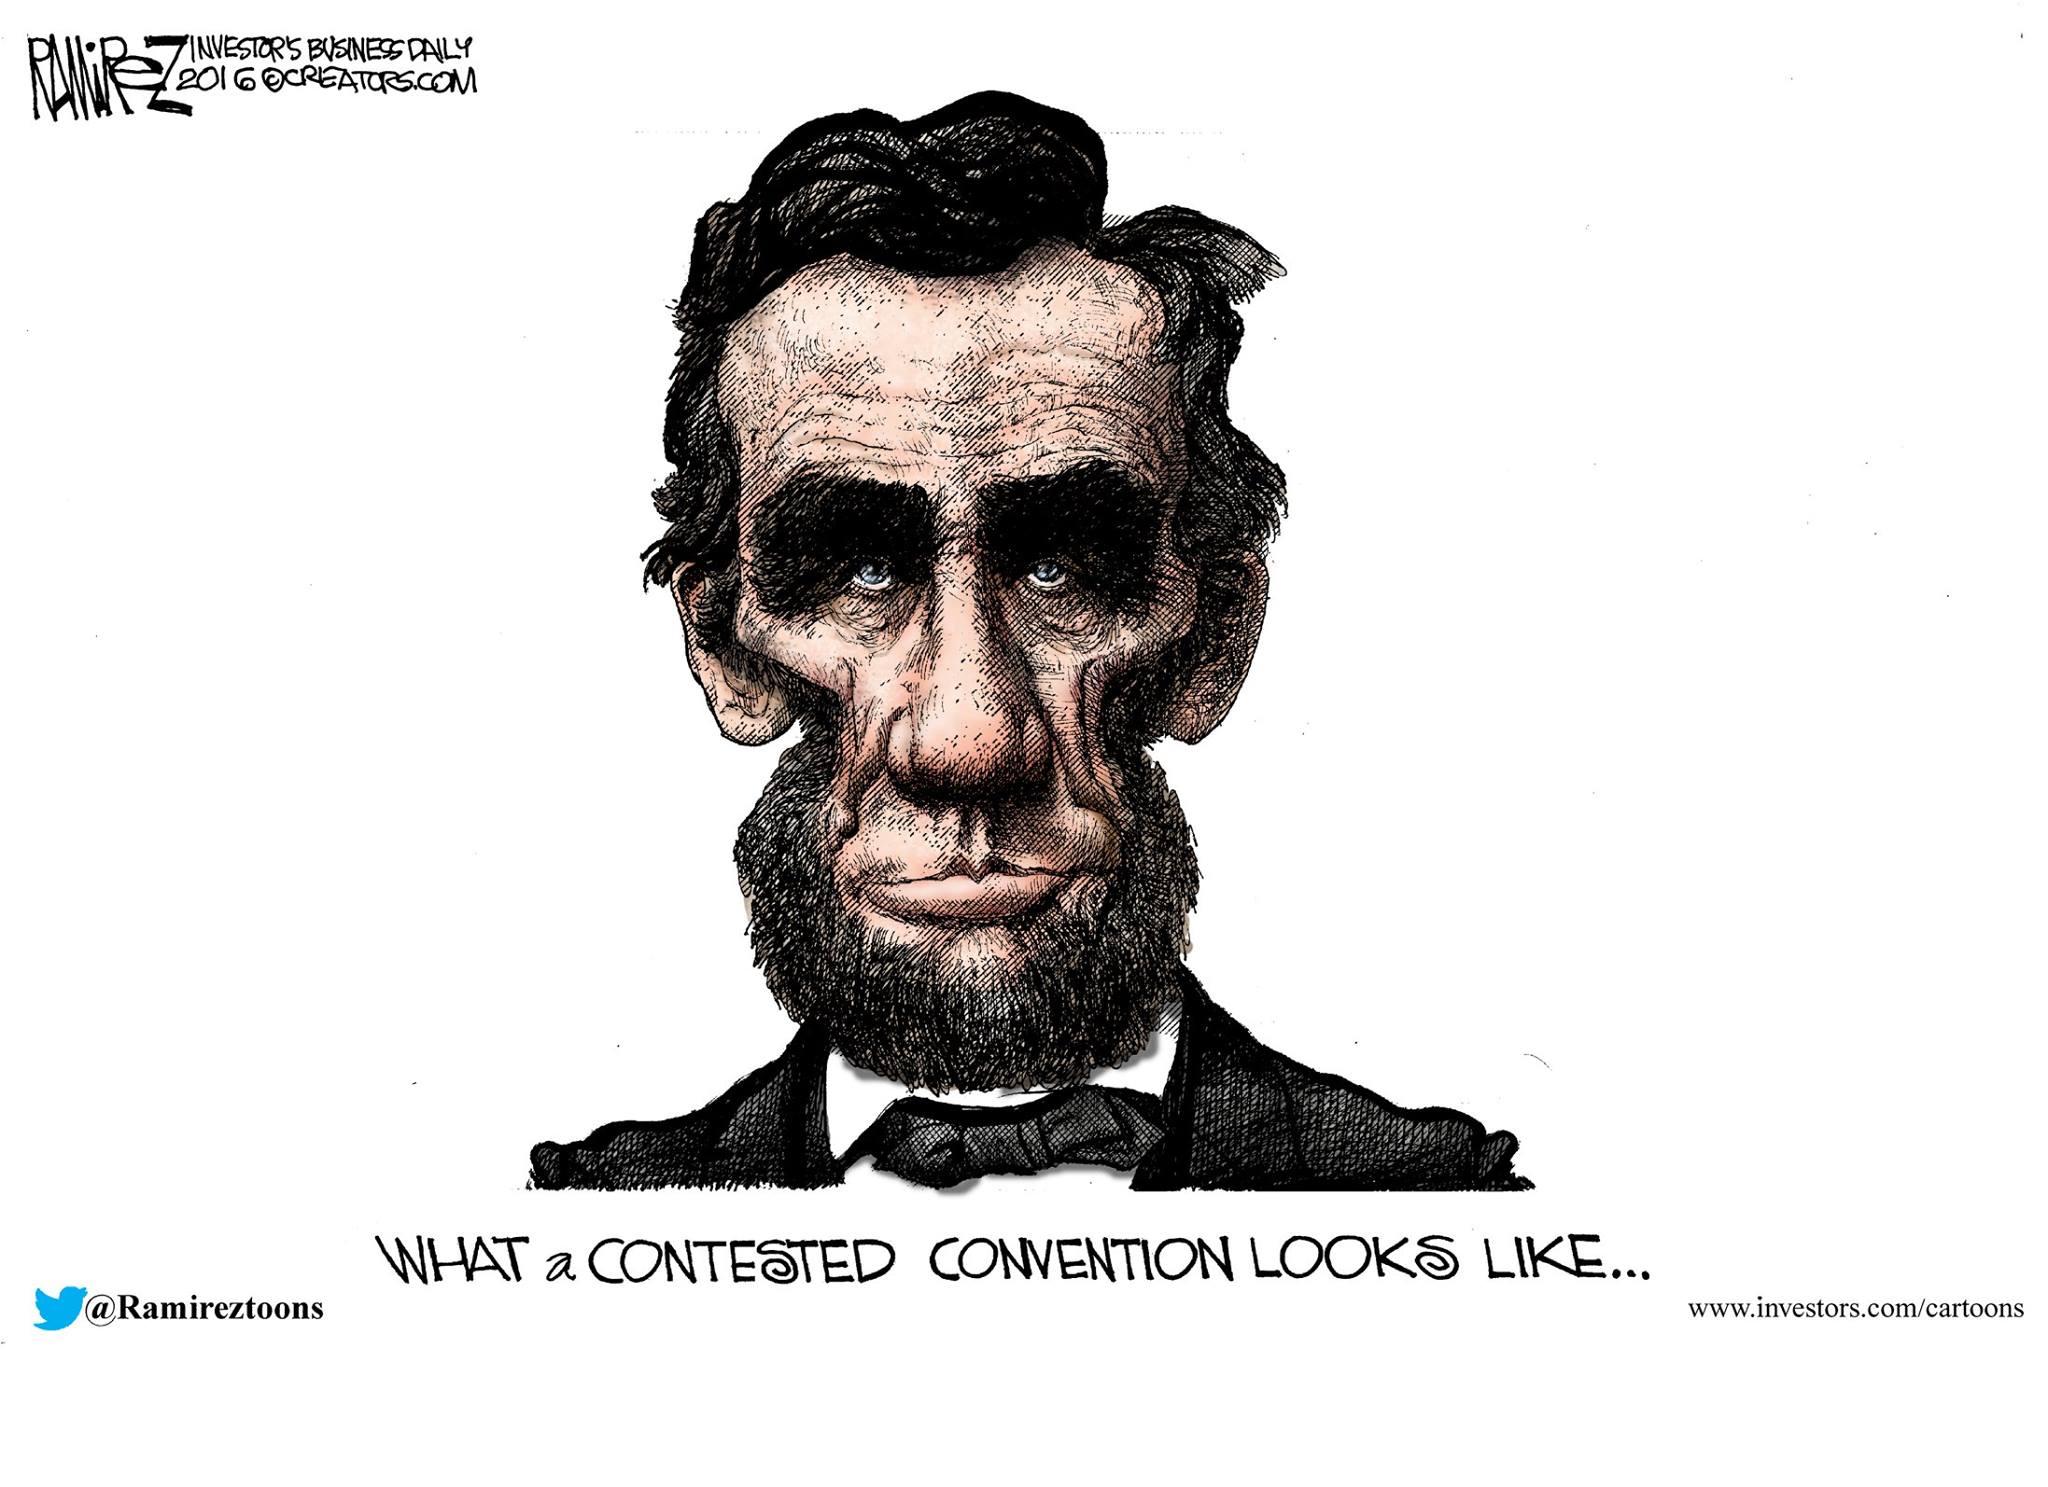 Cruz contested election Lincoln